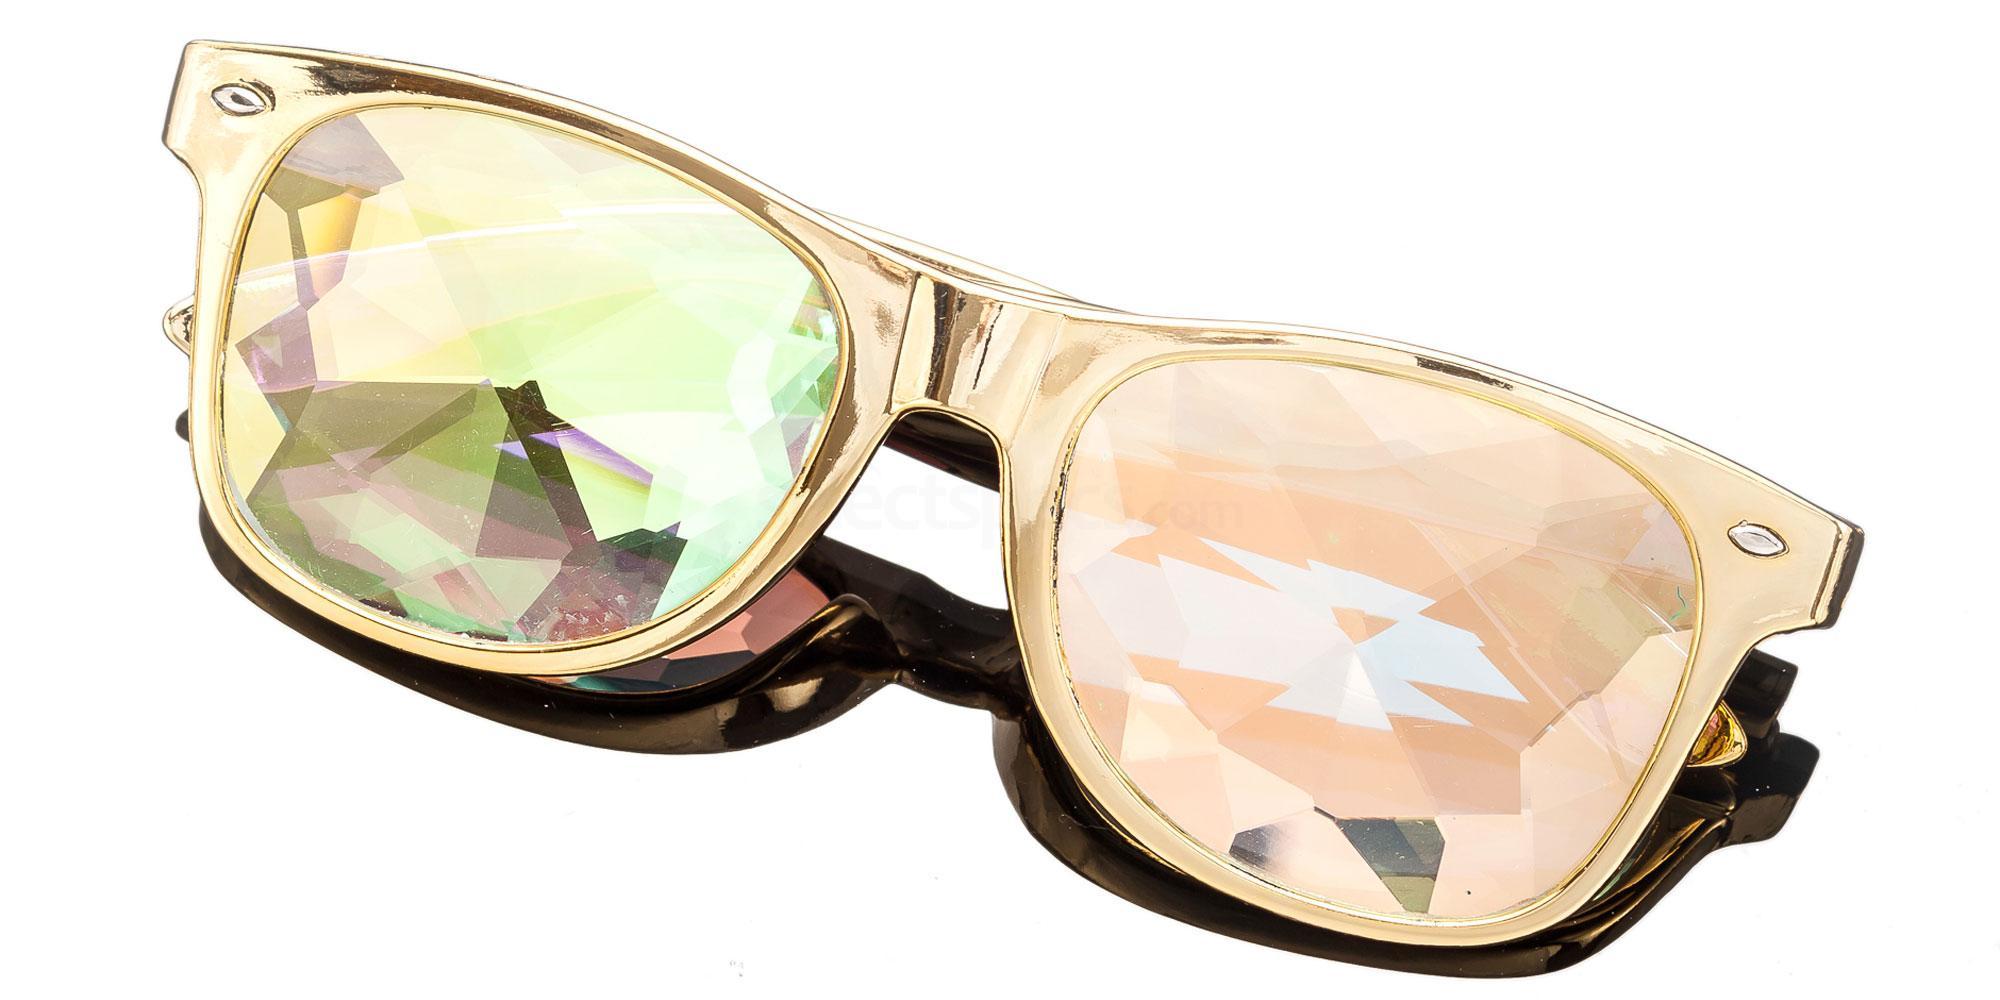 Gold Wayfarer Style Frame / Spine Rainbow Lense 1005K-4 Accessories, Kolor Kaleido